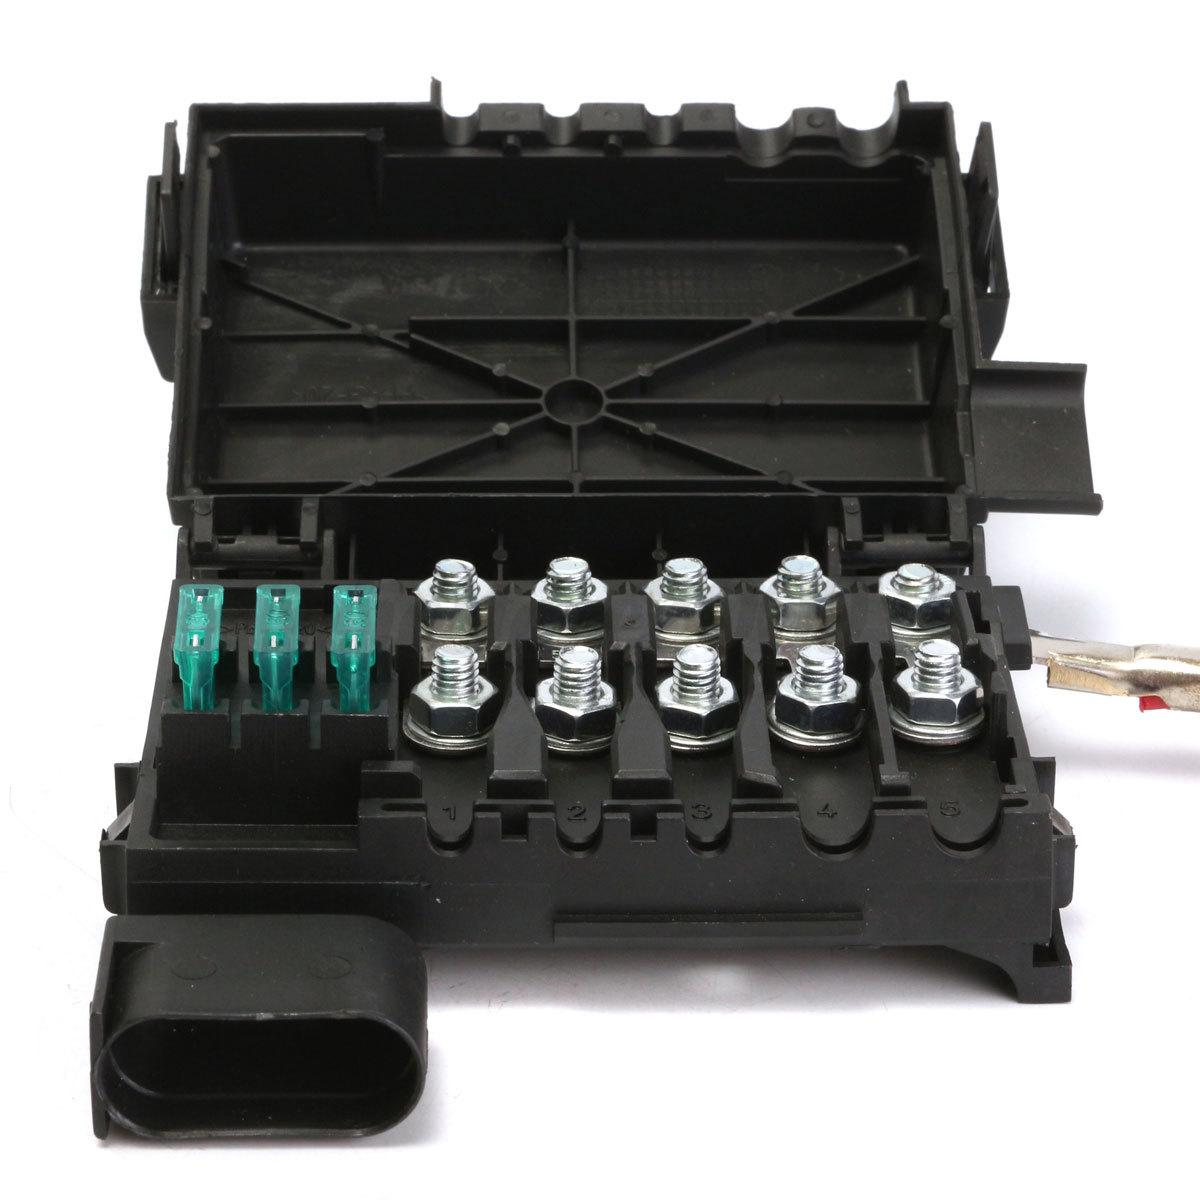 Mk4 Golf Fuse Box Radio : For vw jetta golf mk beetle fuse box battery